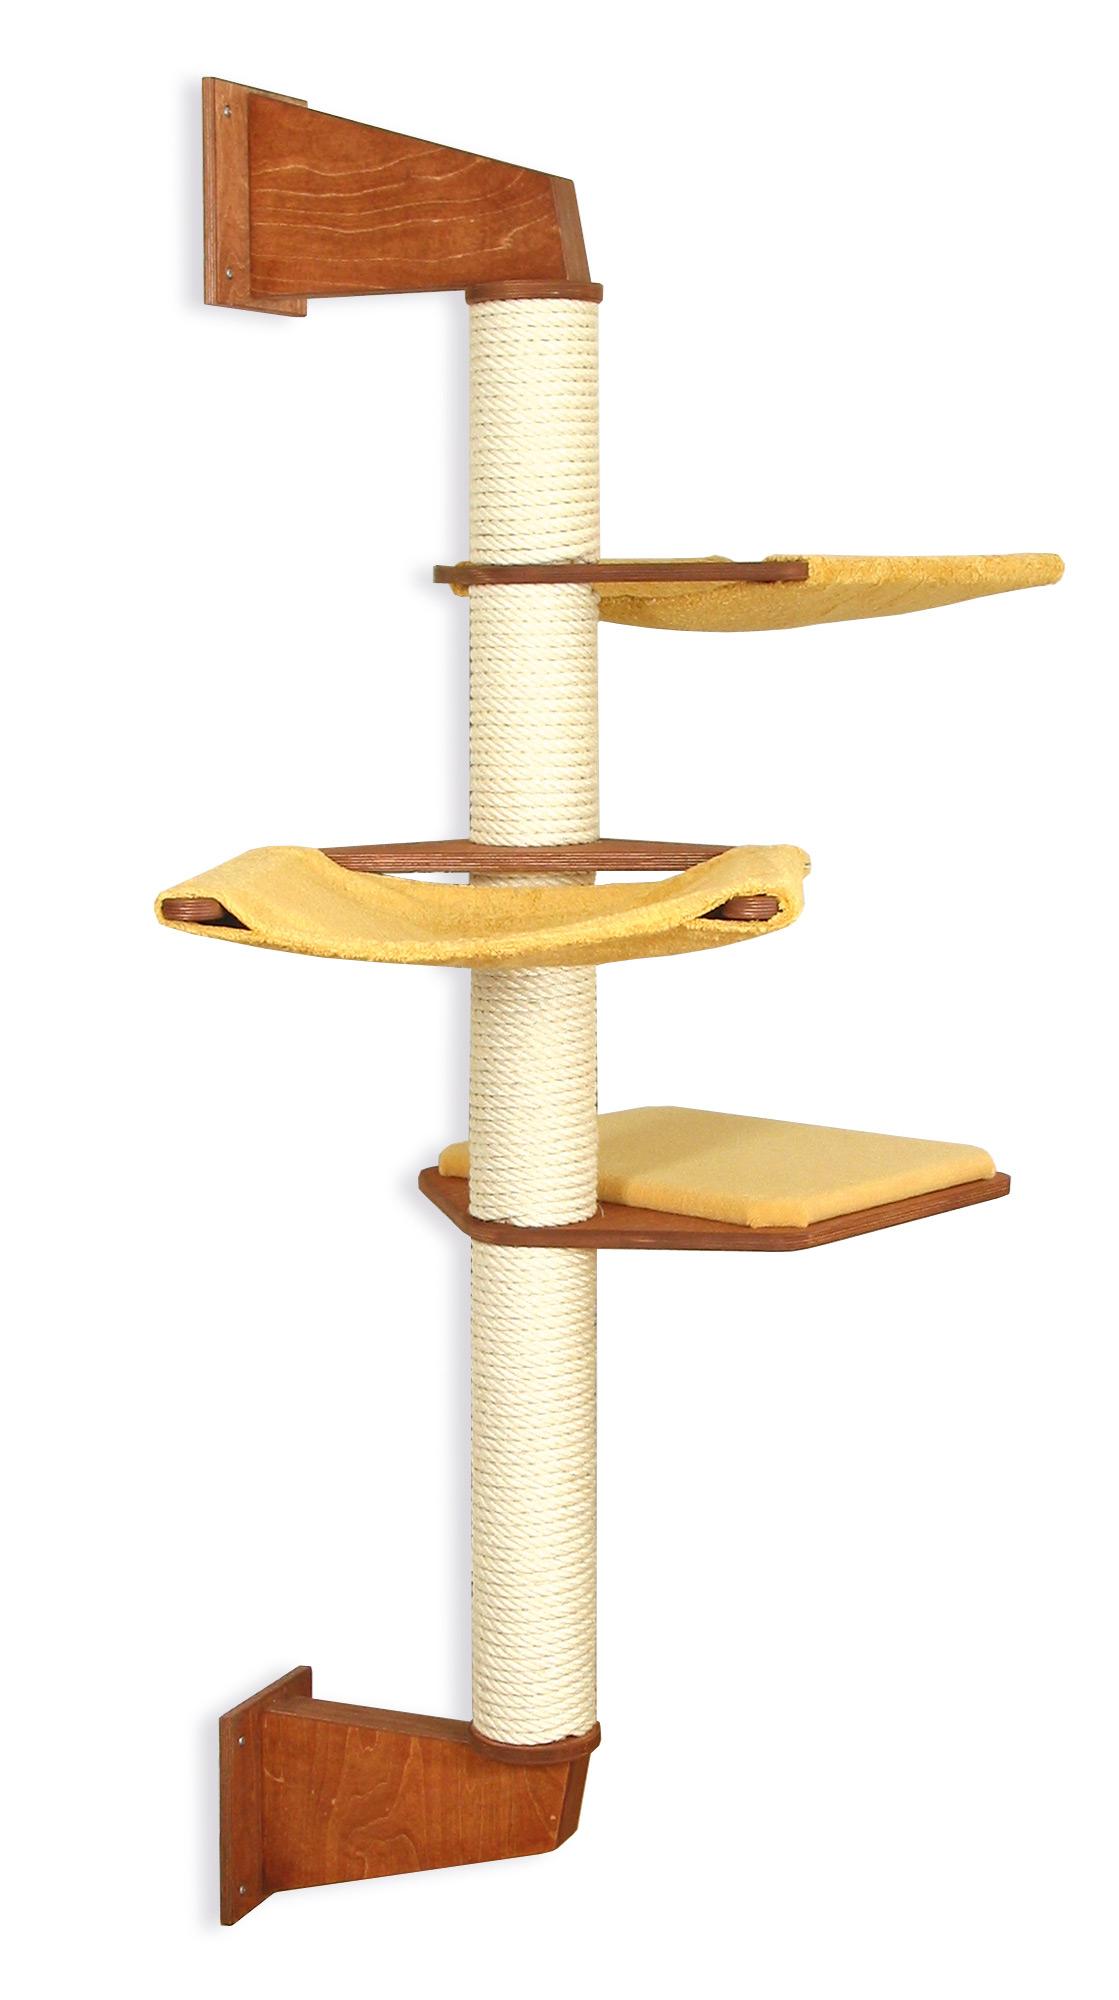 wandkratzbaum f r gro e katzen mit bequemen h ngematten profeline katzenshop. Black Bedroom Furniture Sets. Home Design Ideas